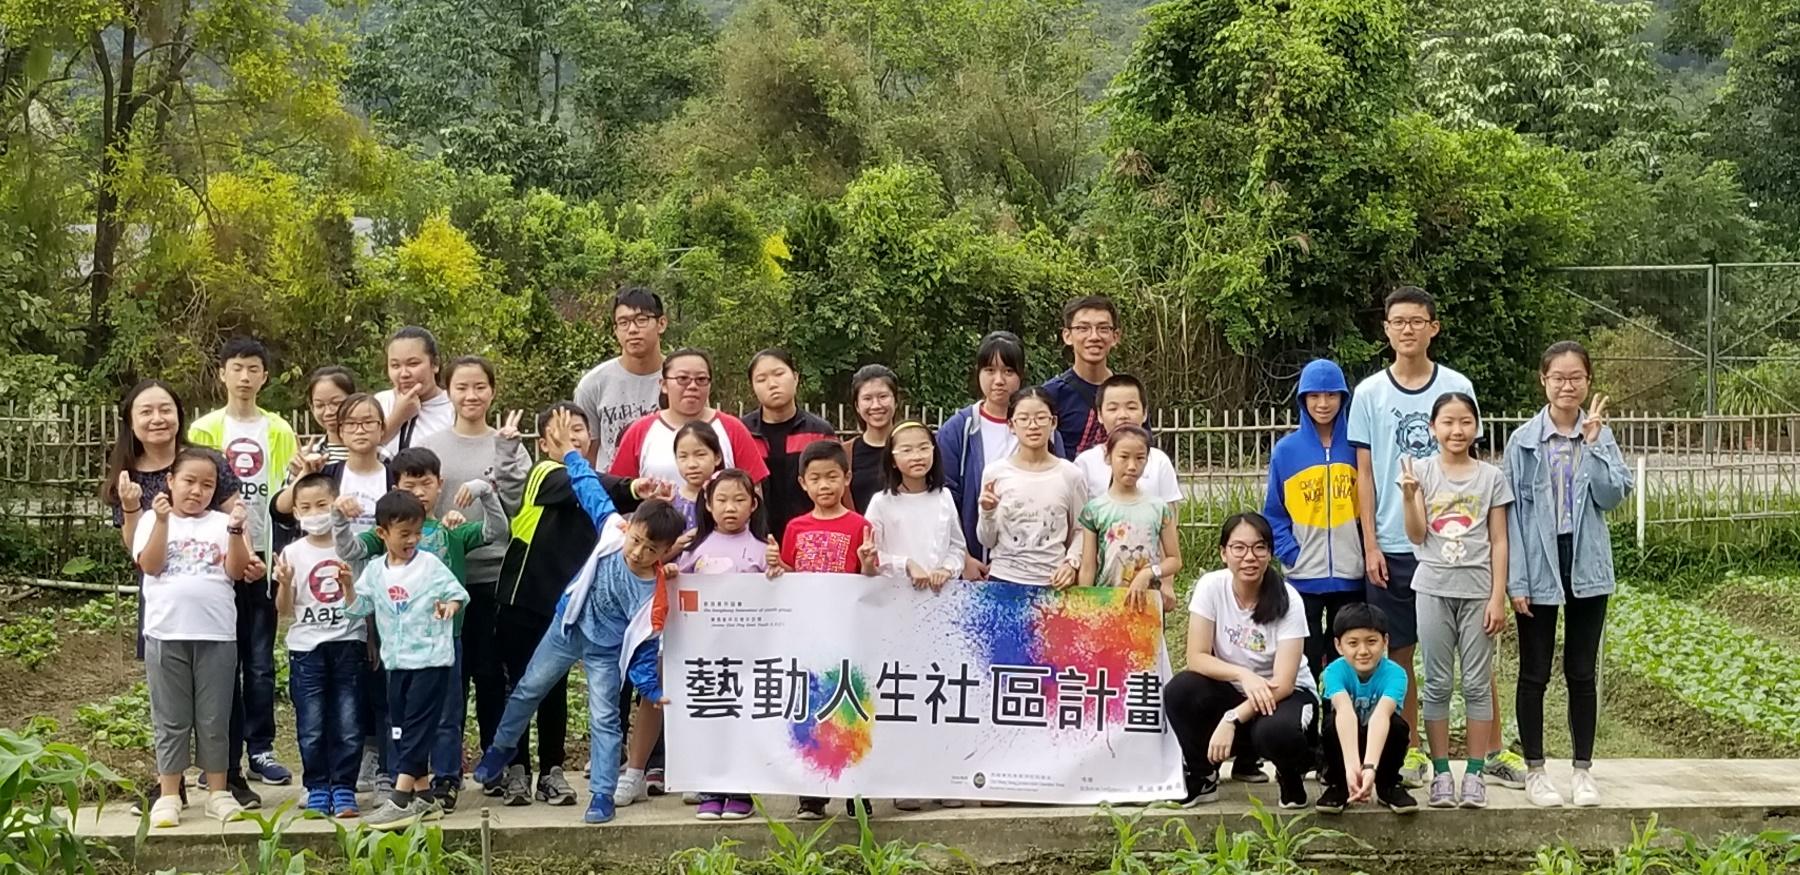 http://npc.edu.hk/sites/default/files/20181104_111852.jpg